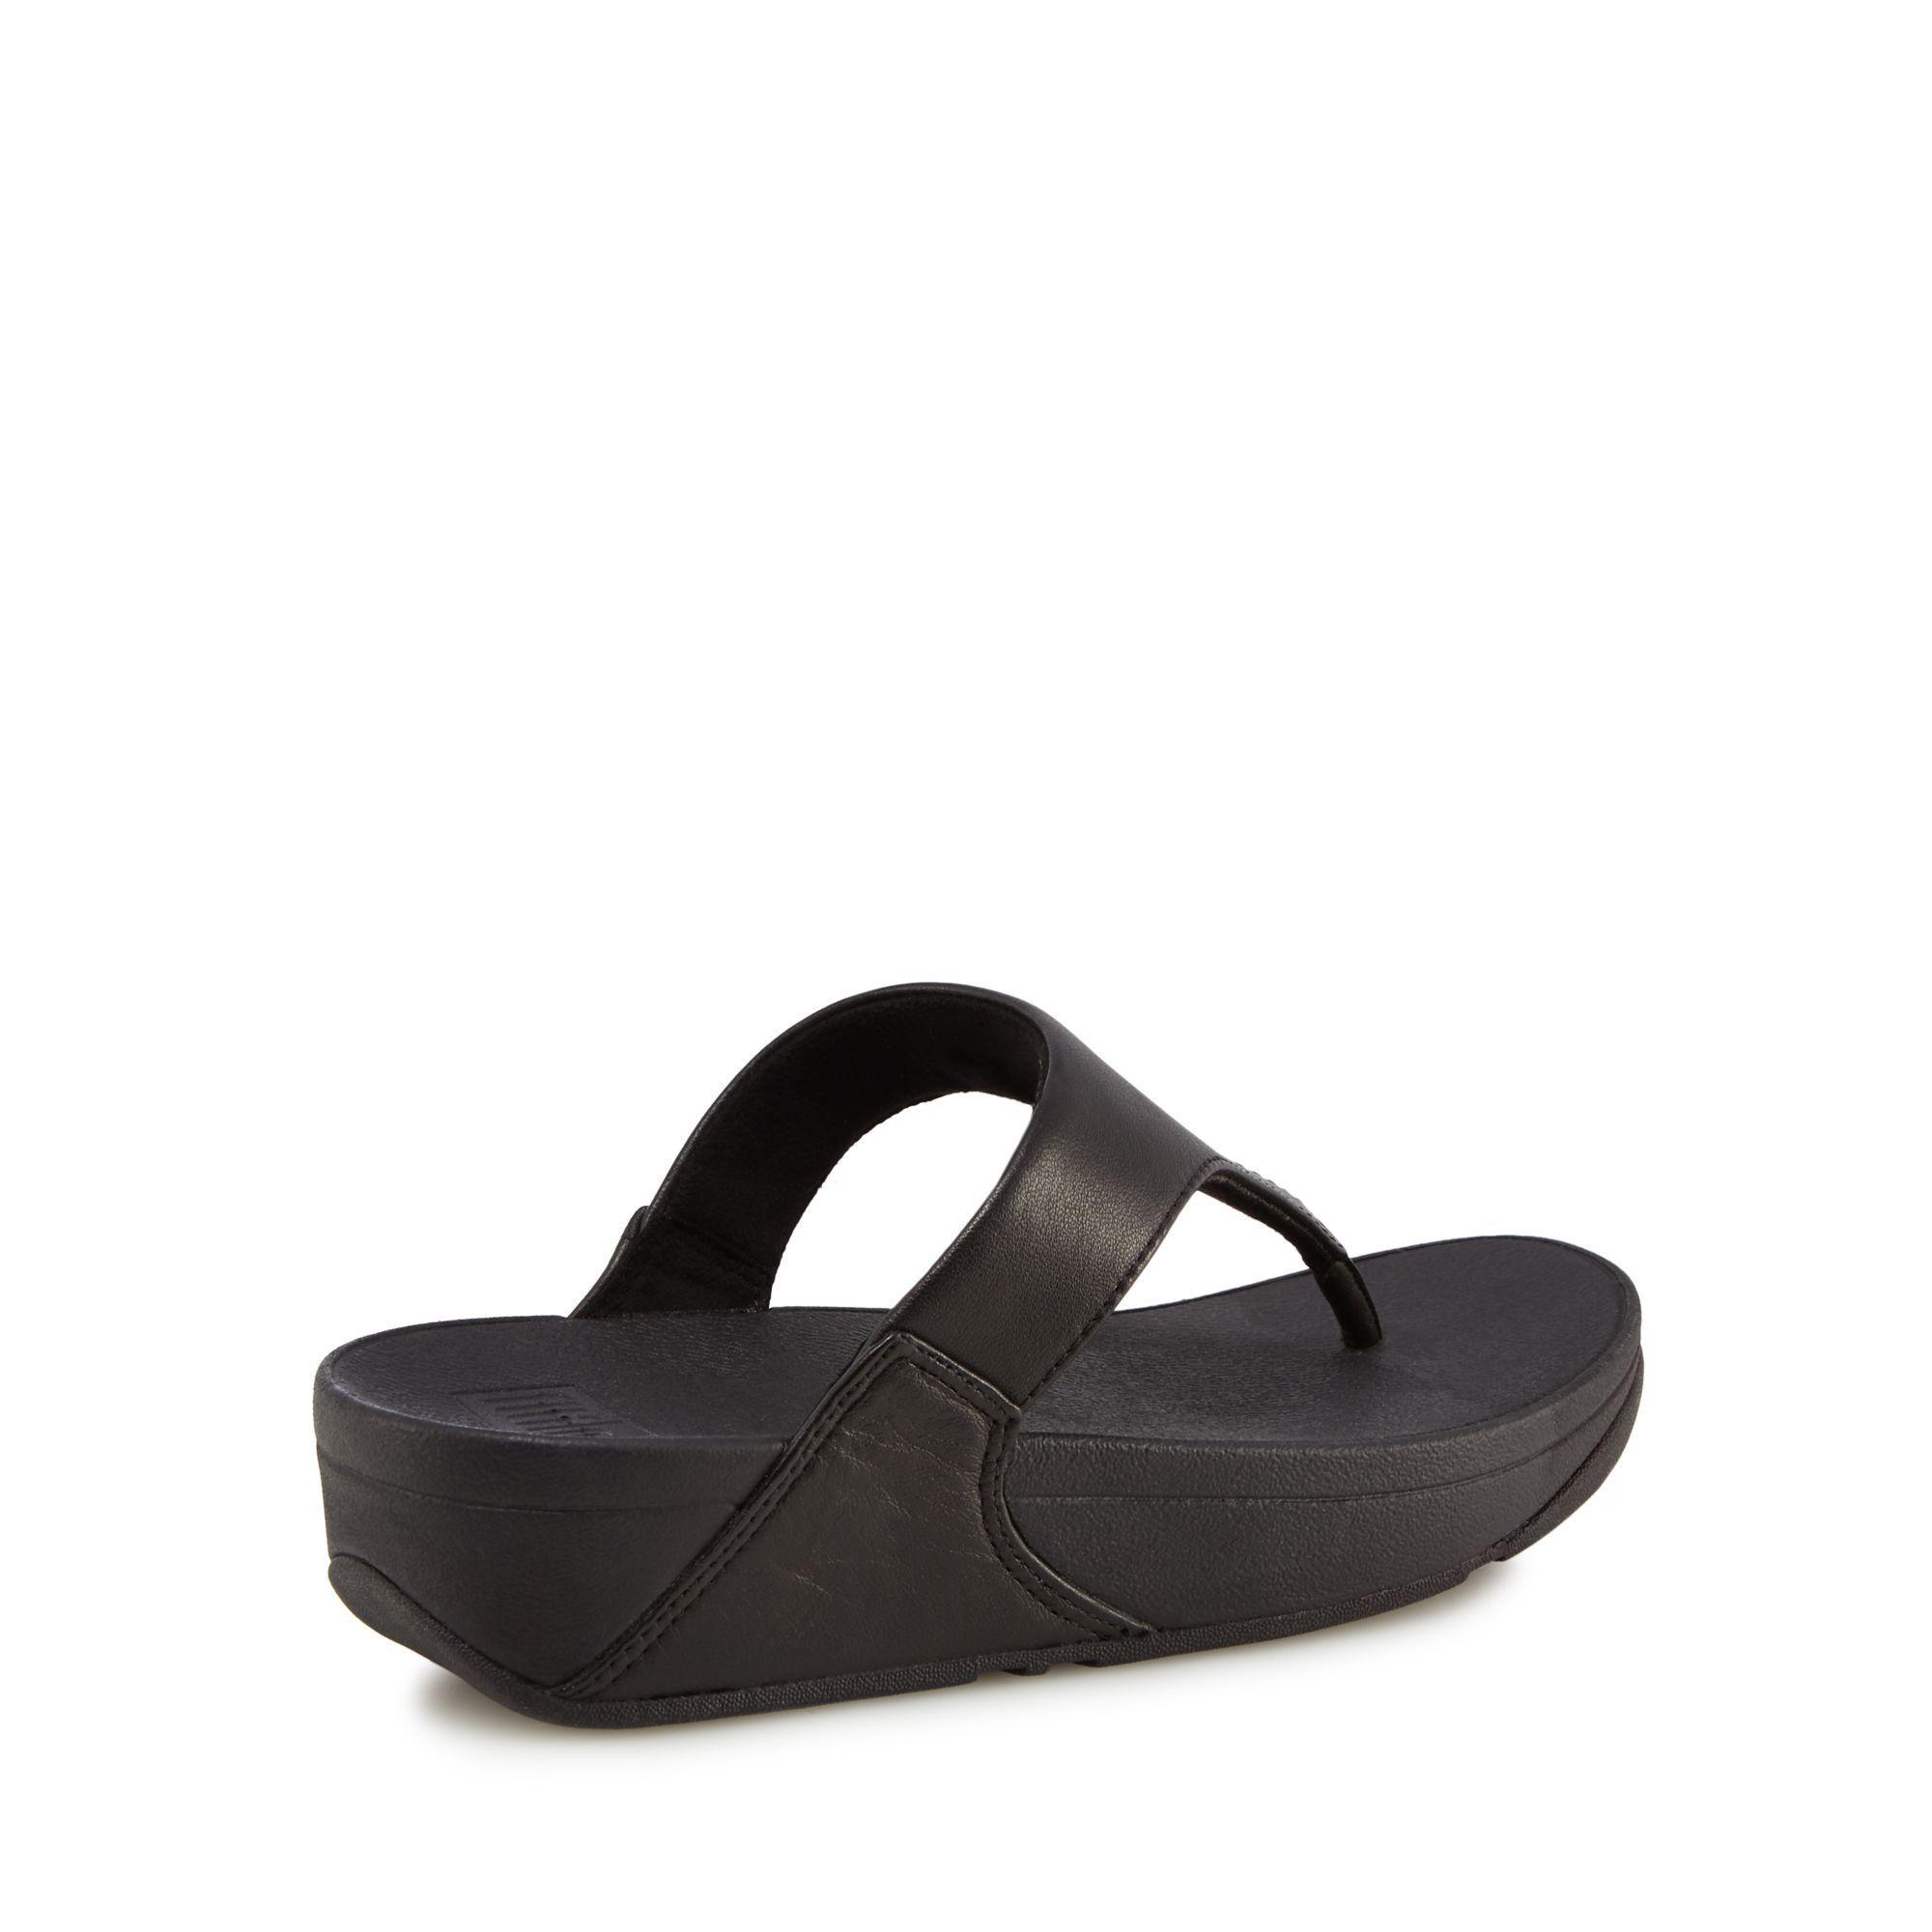 21940d00241 Fitflop Black Leather  lulu  Mid Flatform Heel Flip Flops in Black ...